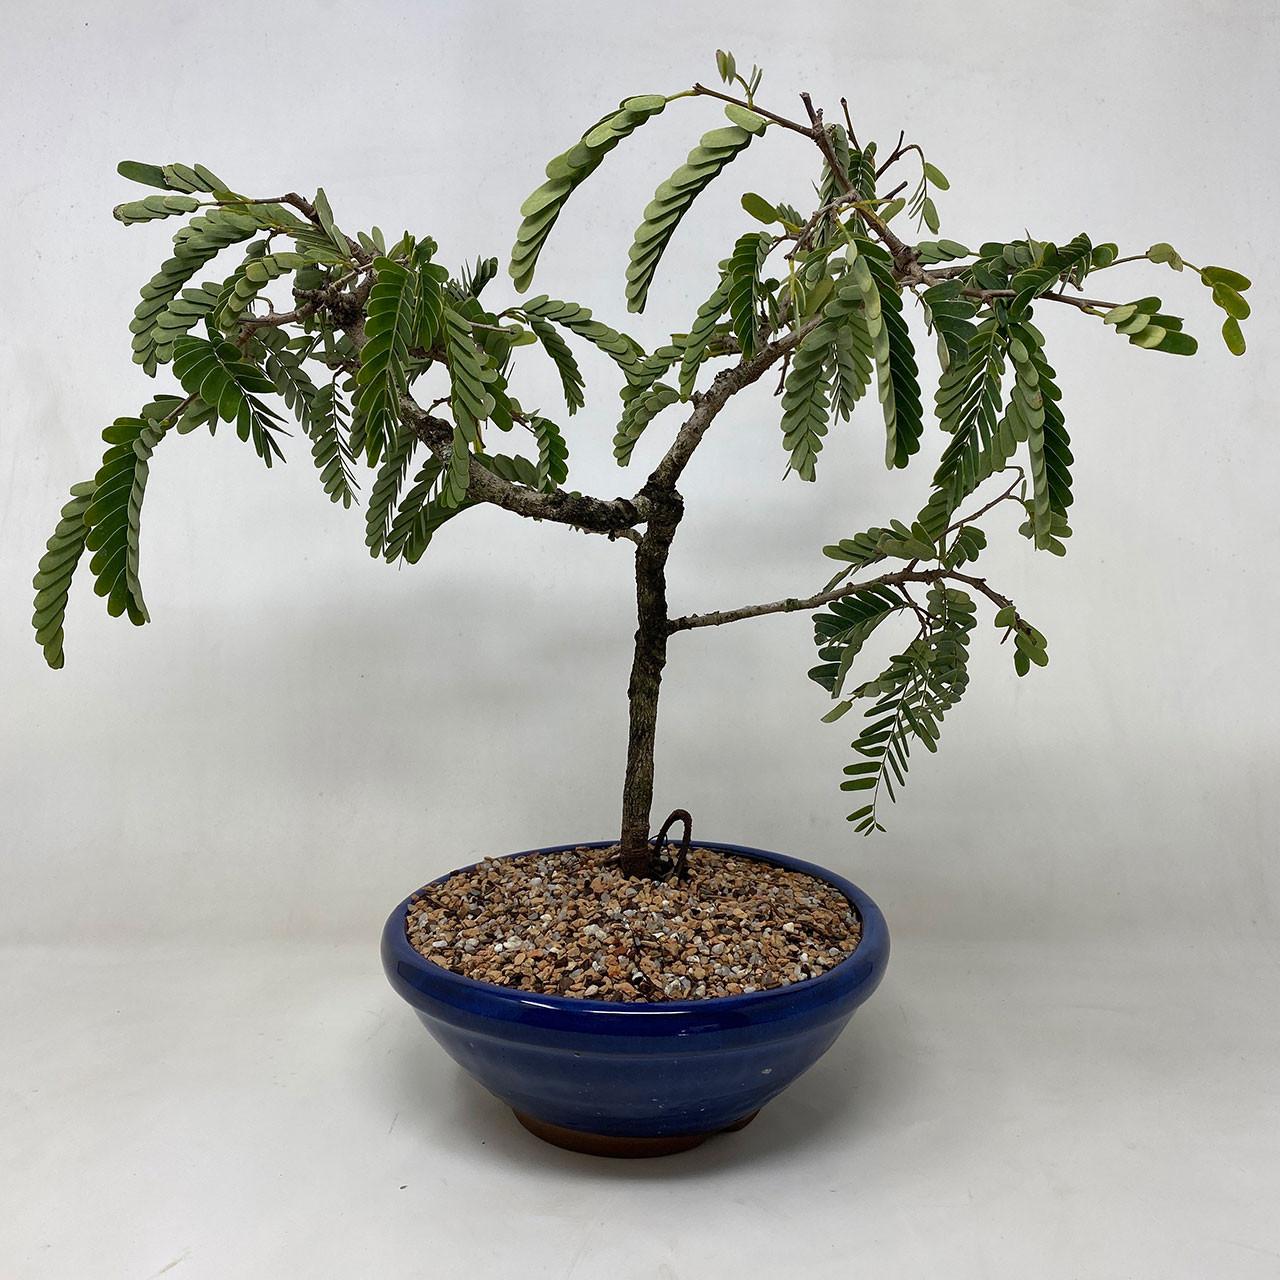 Tamarind Bonsai Tree Bonsai Outlet